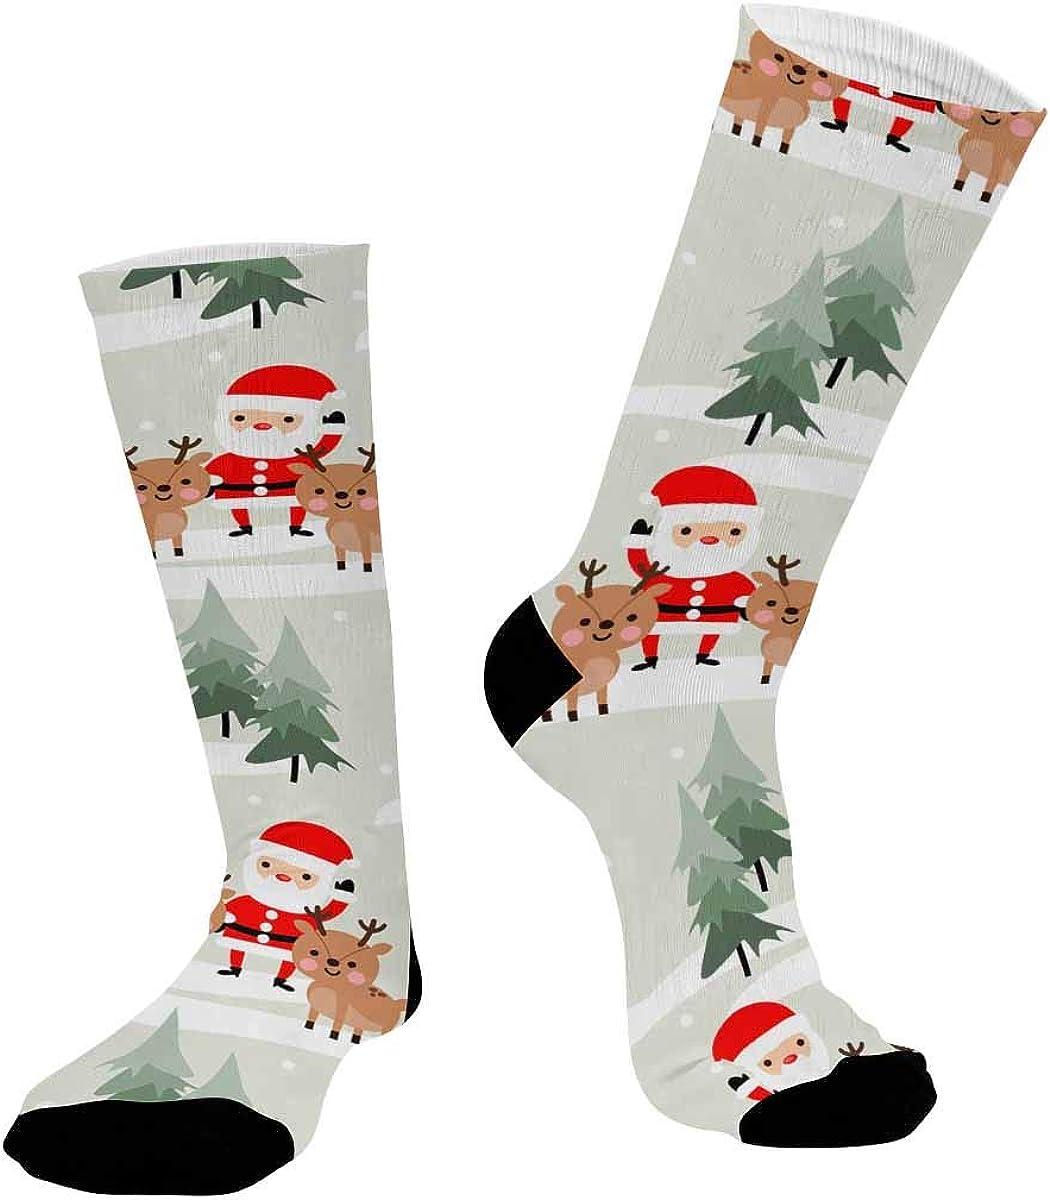 INTERESTPRINT Casual Sublimated Crew Socks Unisex Christmas Santa Claus and Reindeer